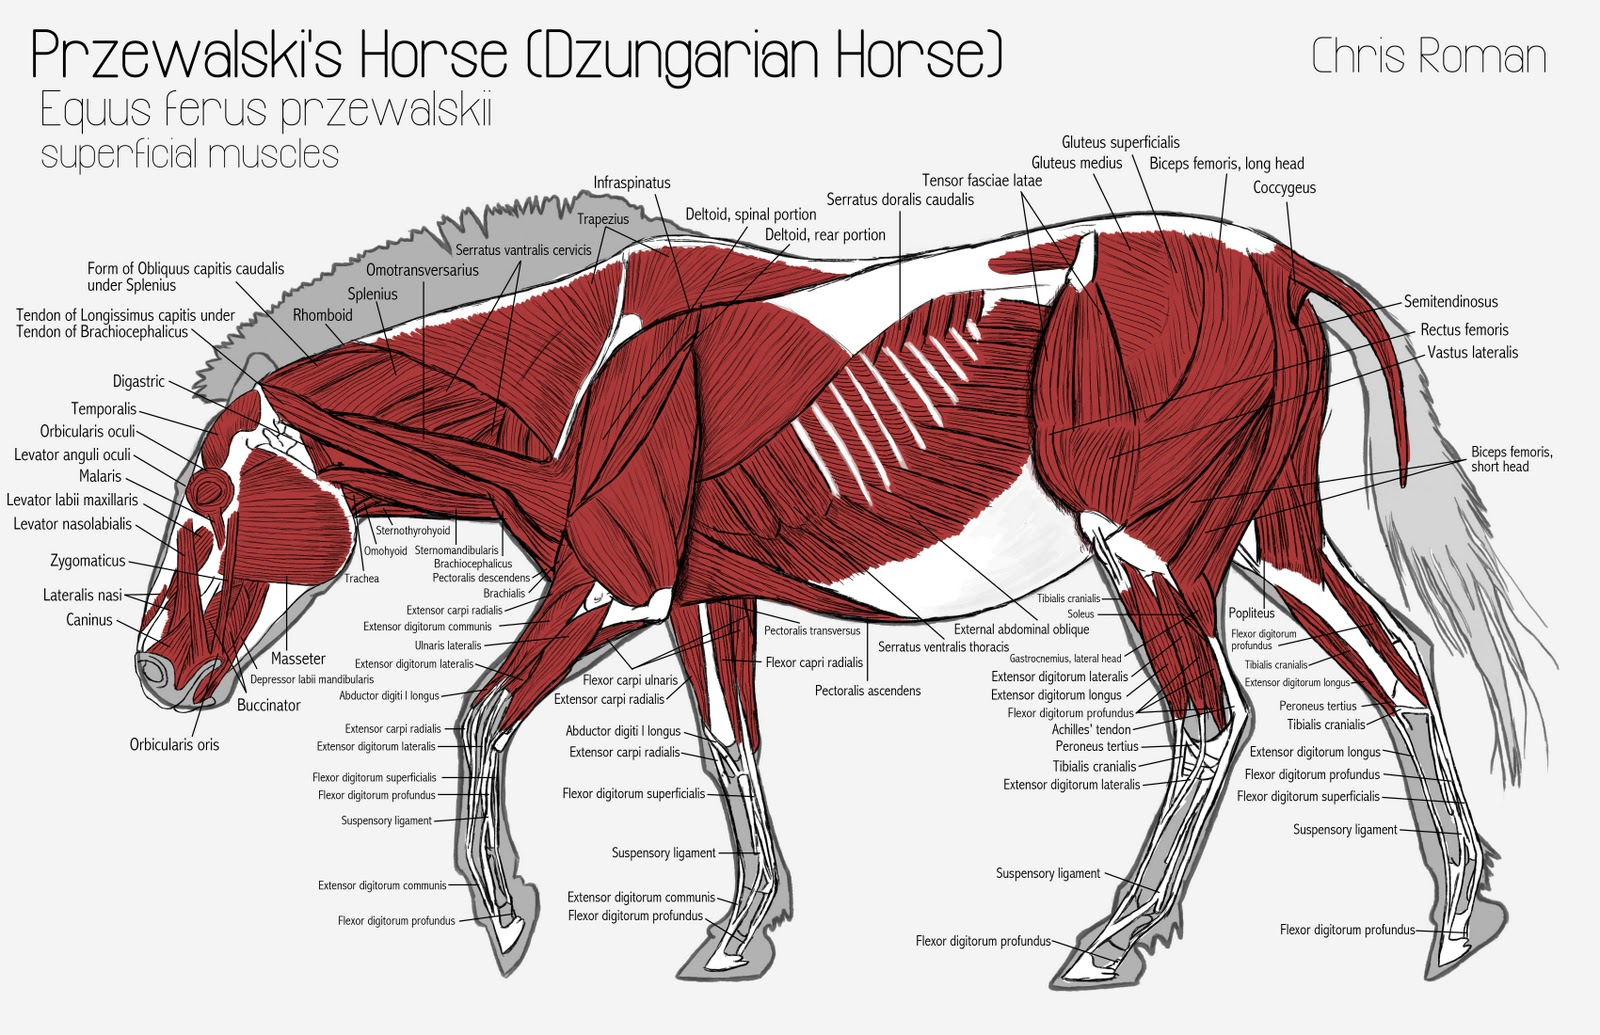 horse muscle and bone diagram er crow s foot chris roman october 2011